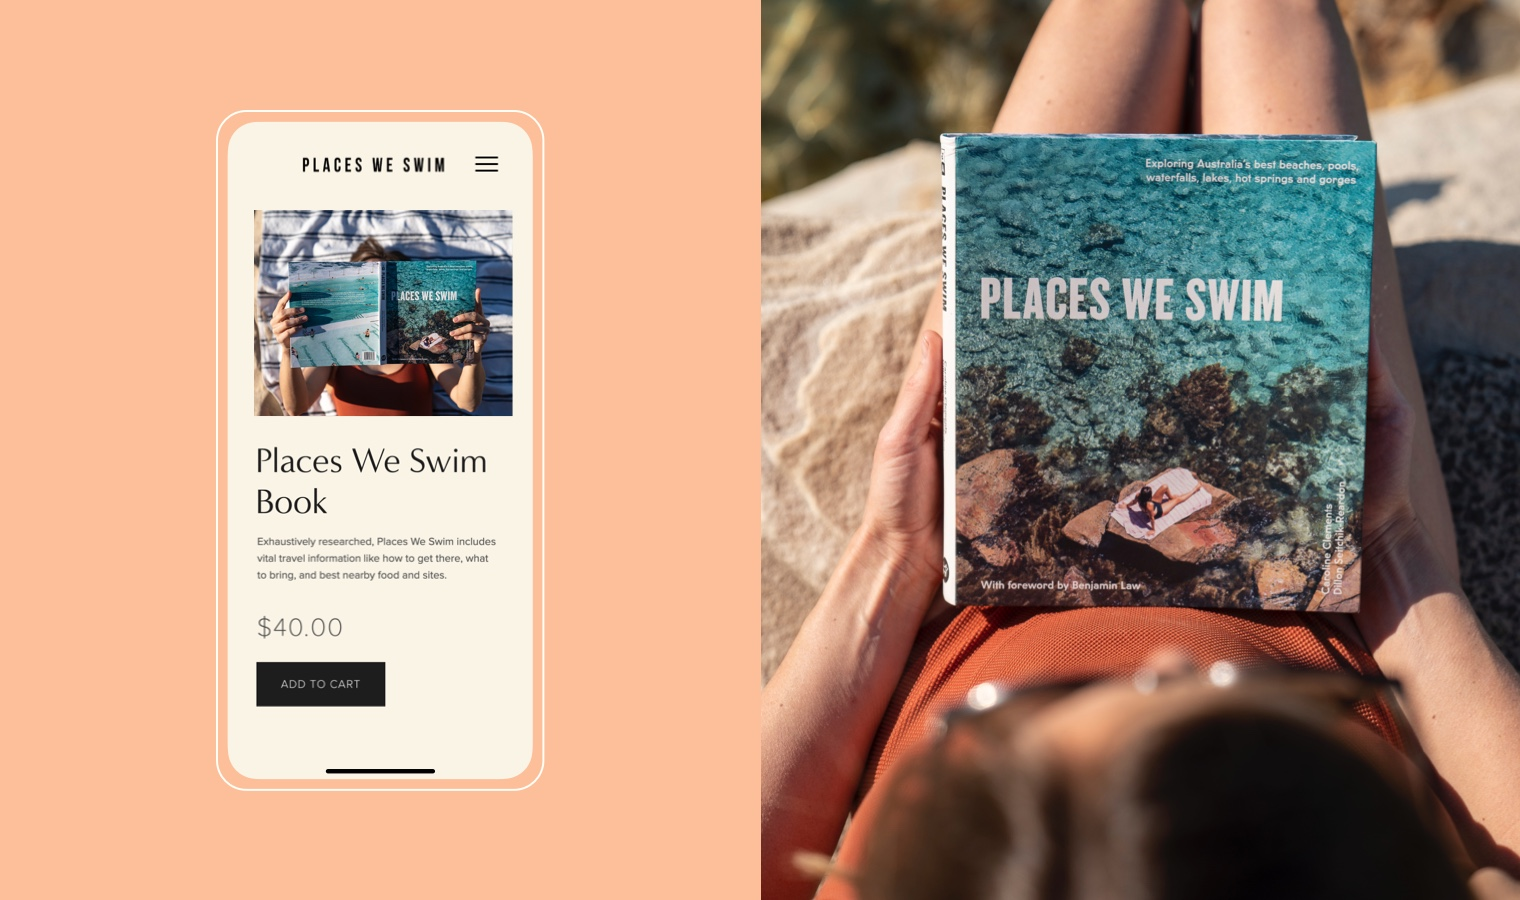 places-we-swim-bronte-ethical-design-agency-sustainable-brands-graphic-designer-sydney-byron-bay-bondi-melbourne-branding.jpg